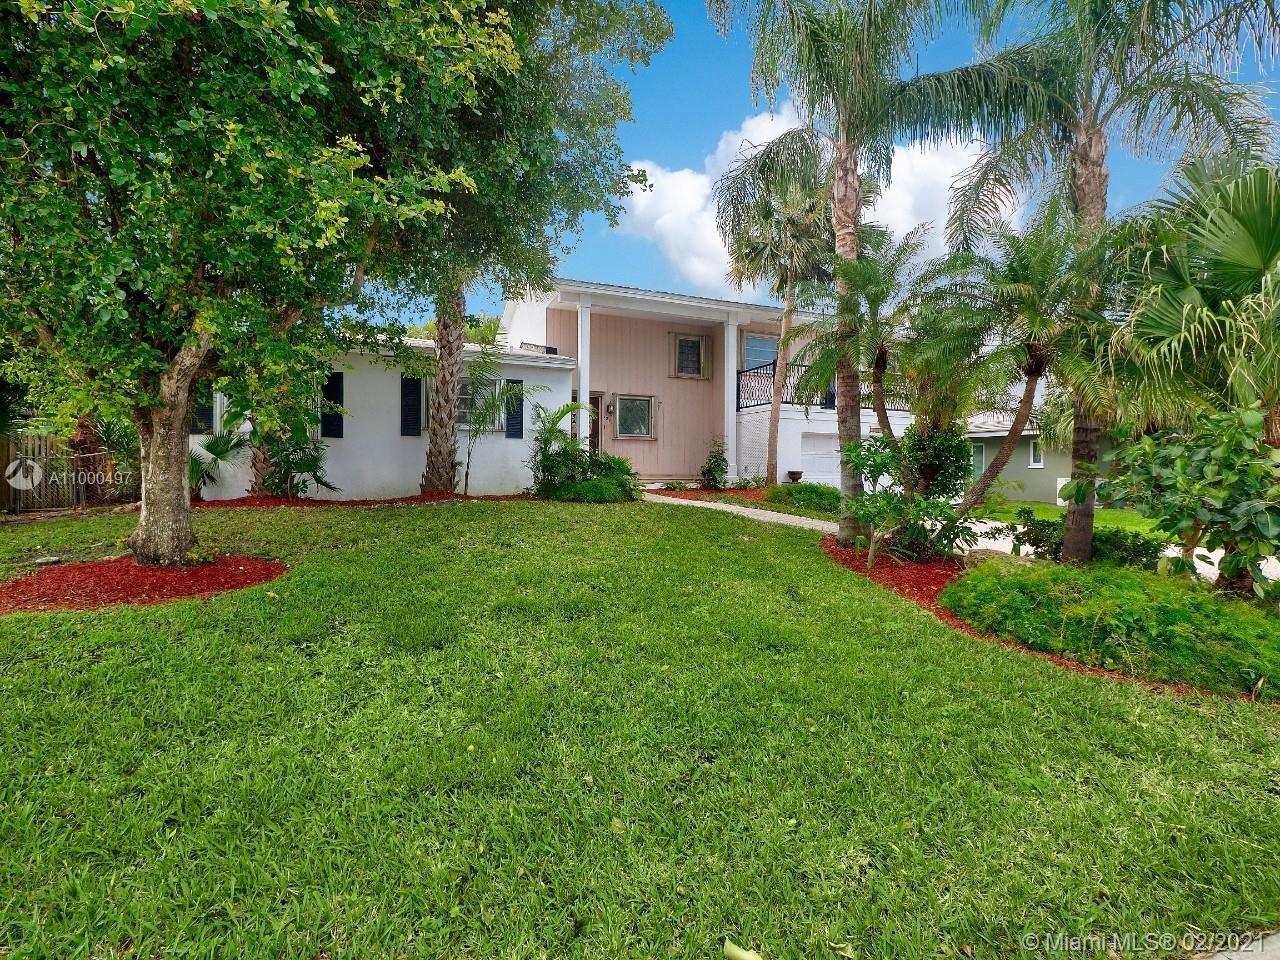 1271 Morse Blvd, Riviera Beach, FL 33404 - #: A11000497